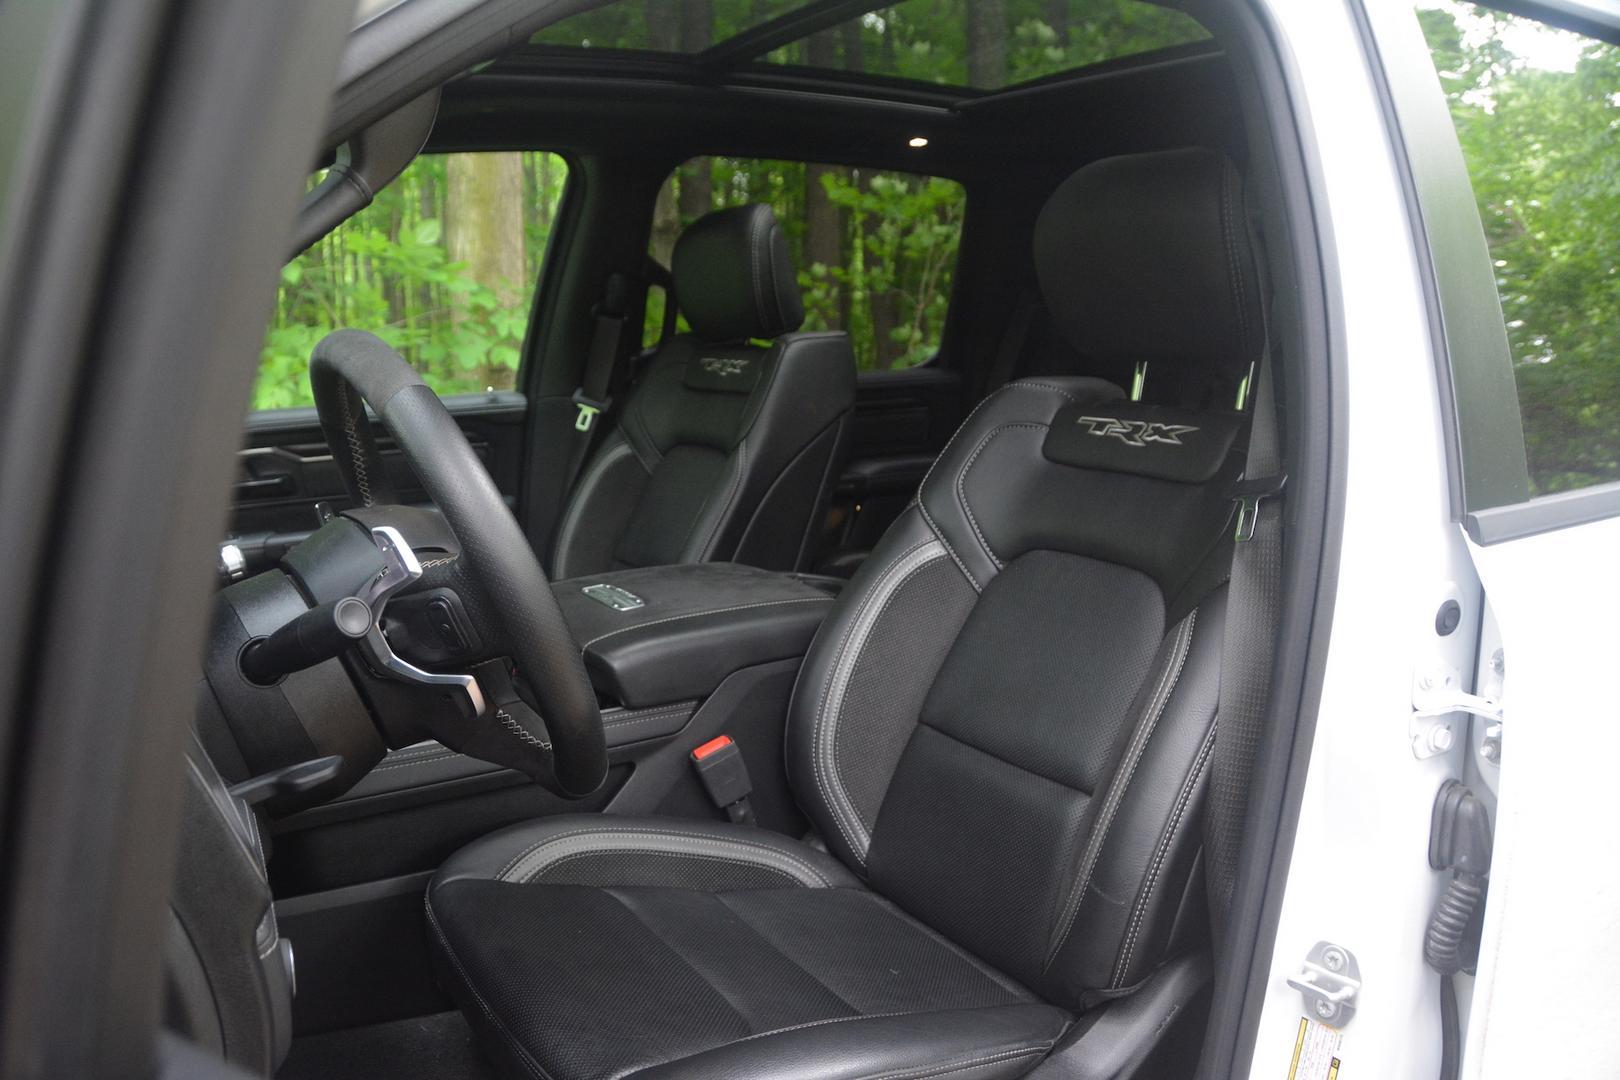 2021 Ram 1500 TRX seats